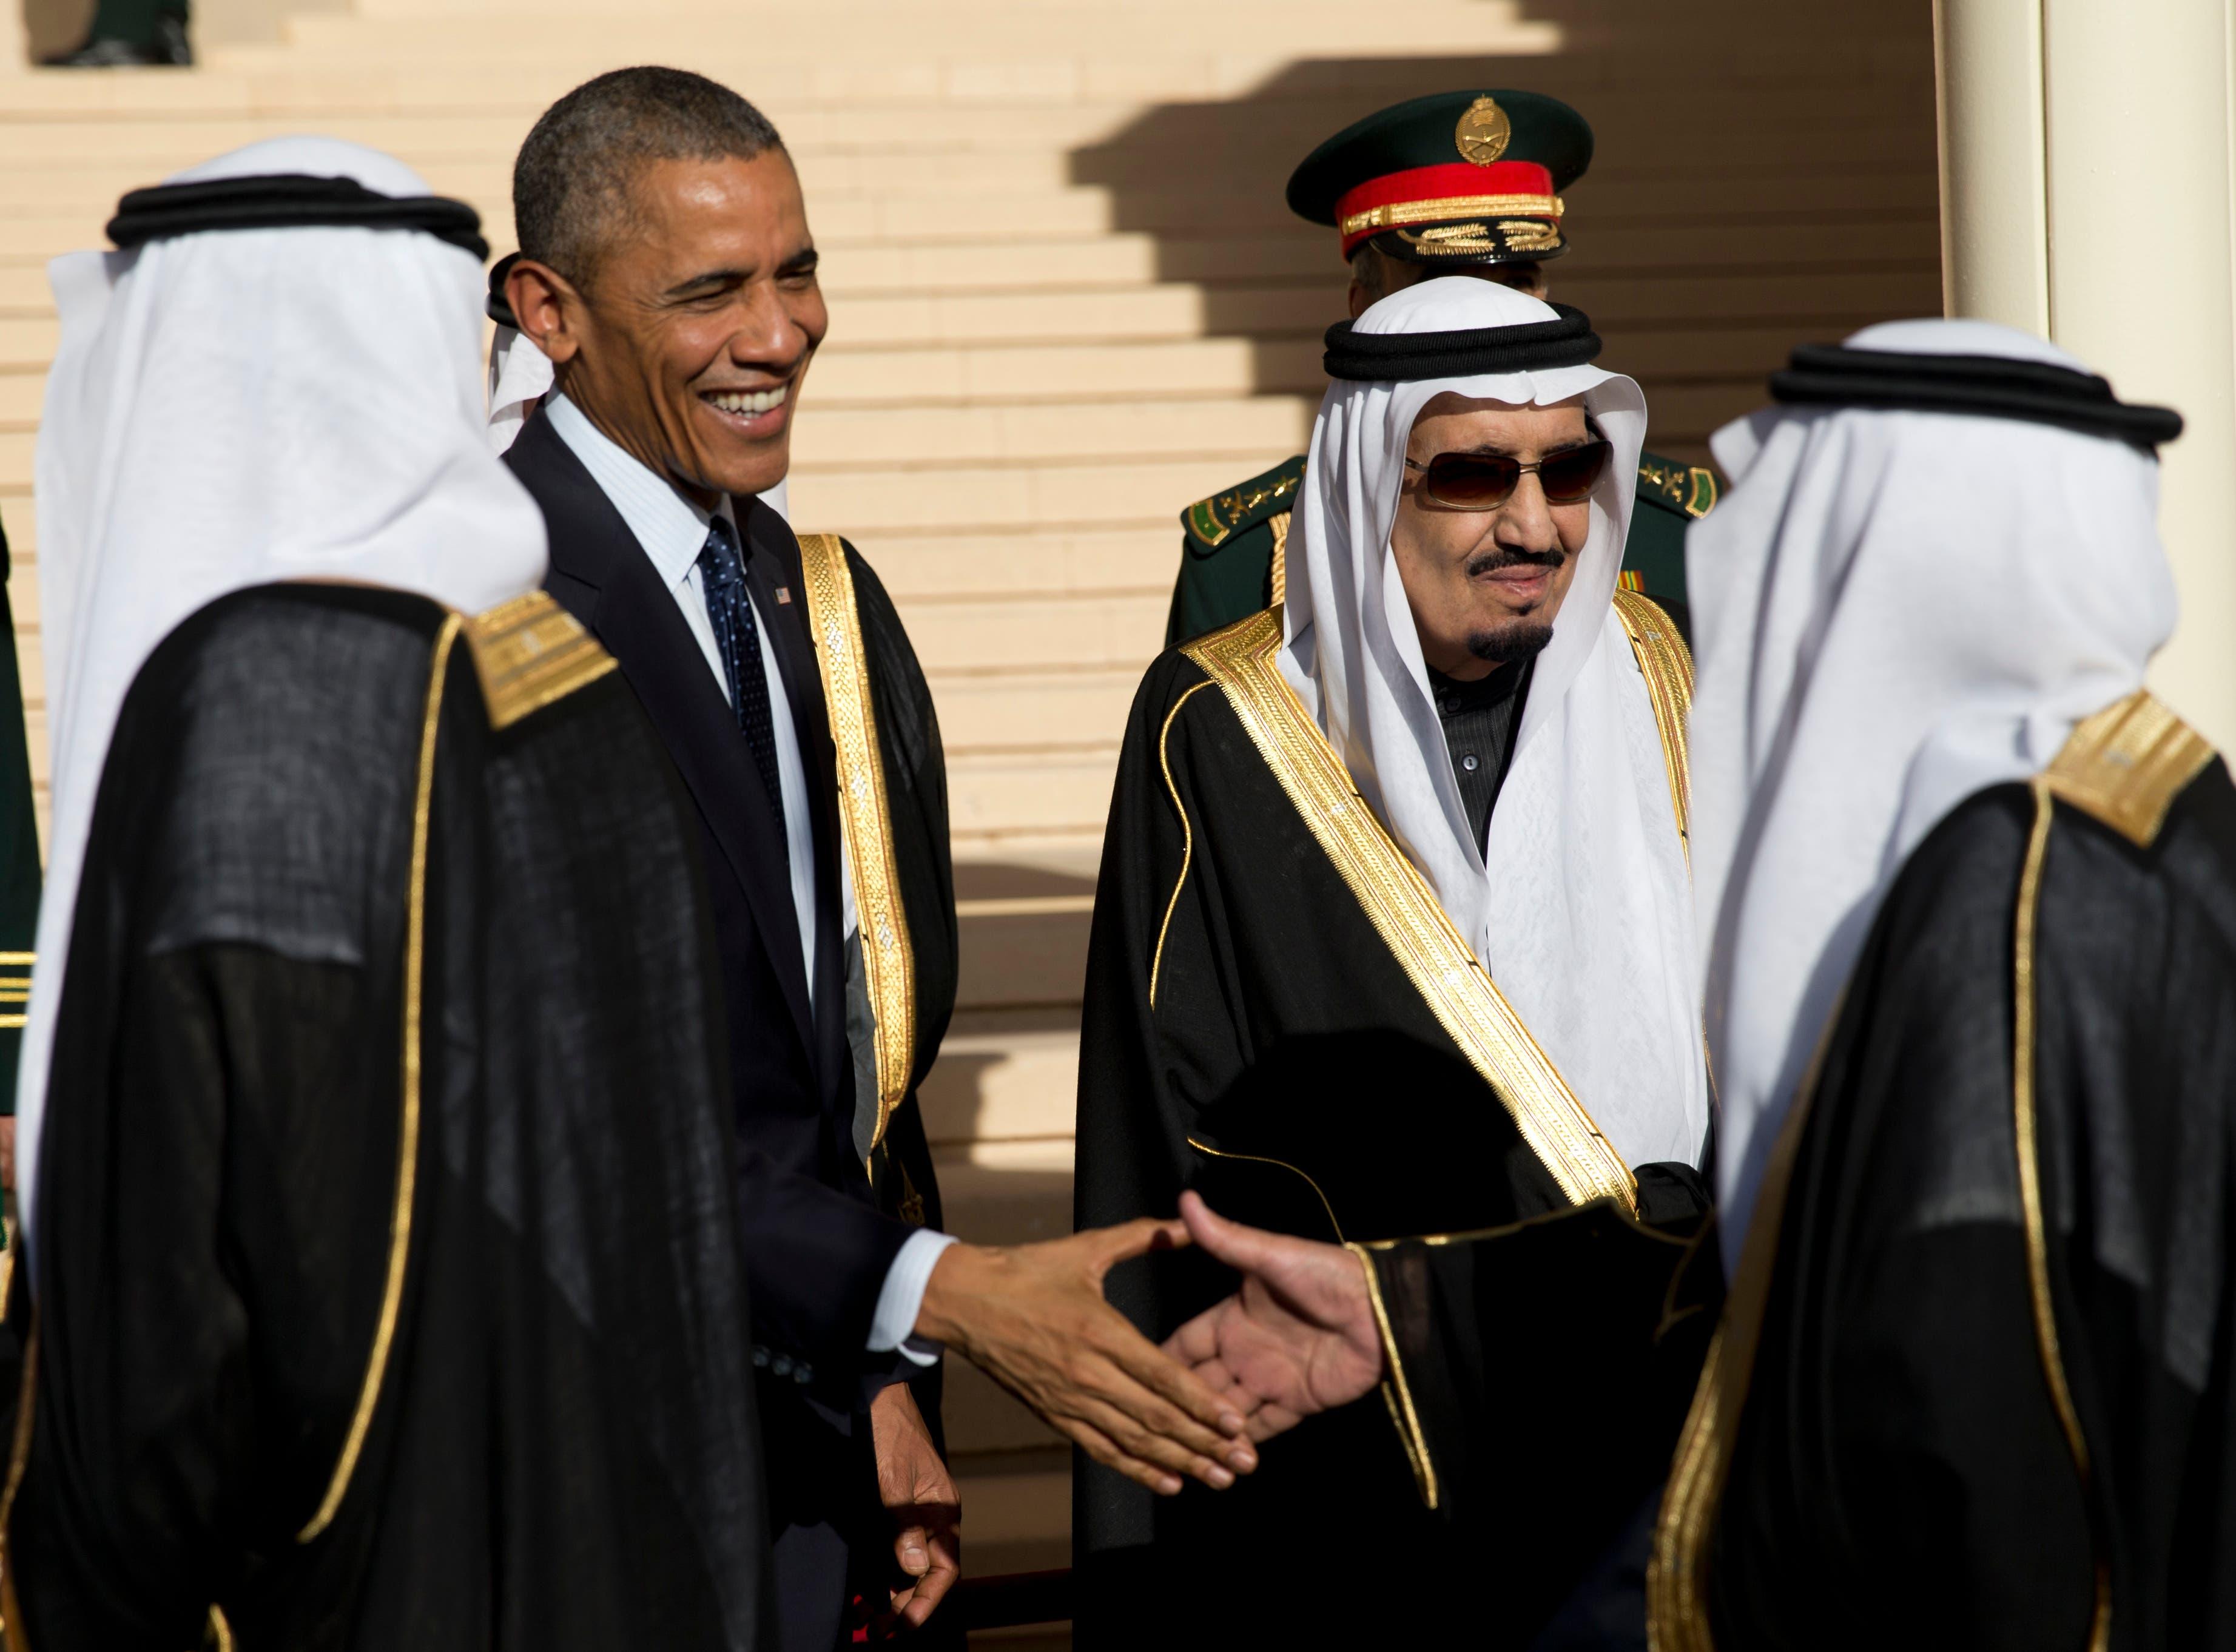 President Barack Obama meets with new Saudi Arabian King, Salman bin Abdul Aziz, at Erga Palace in Riyadh, Saudi Arabia in January. (File: AP)